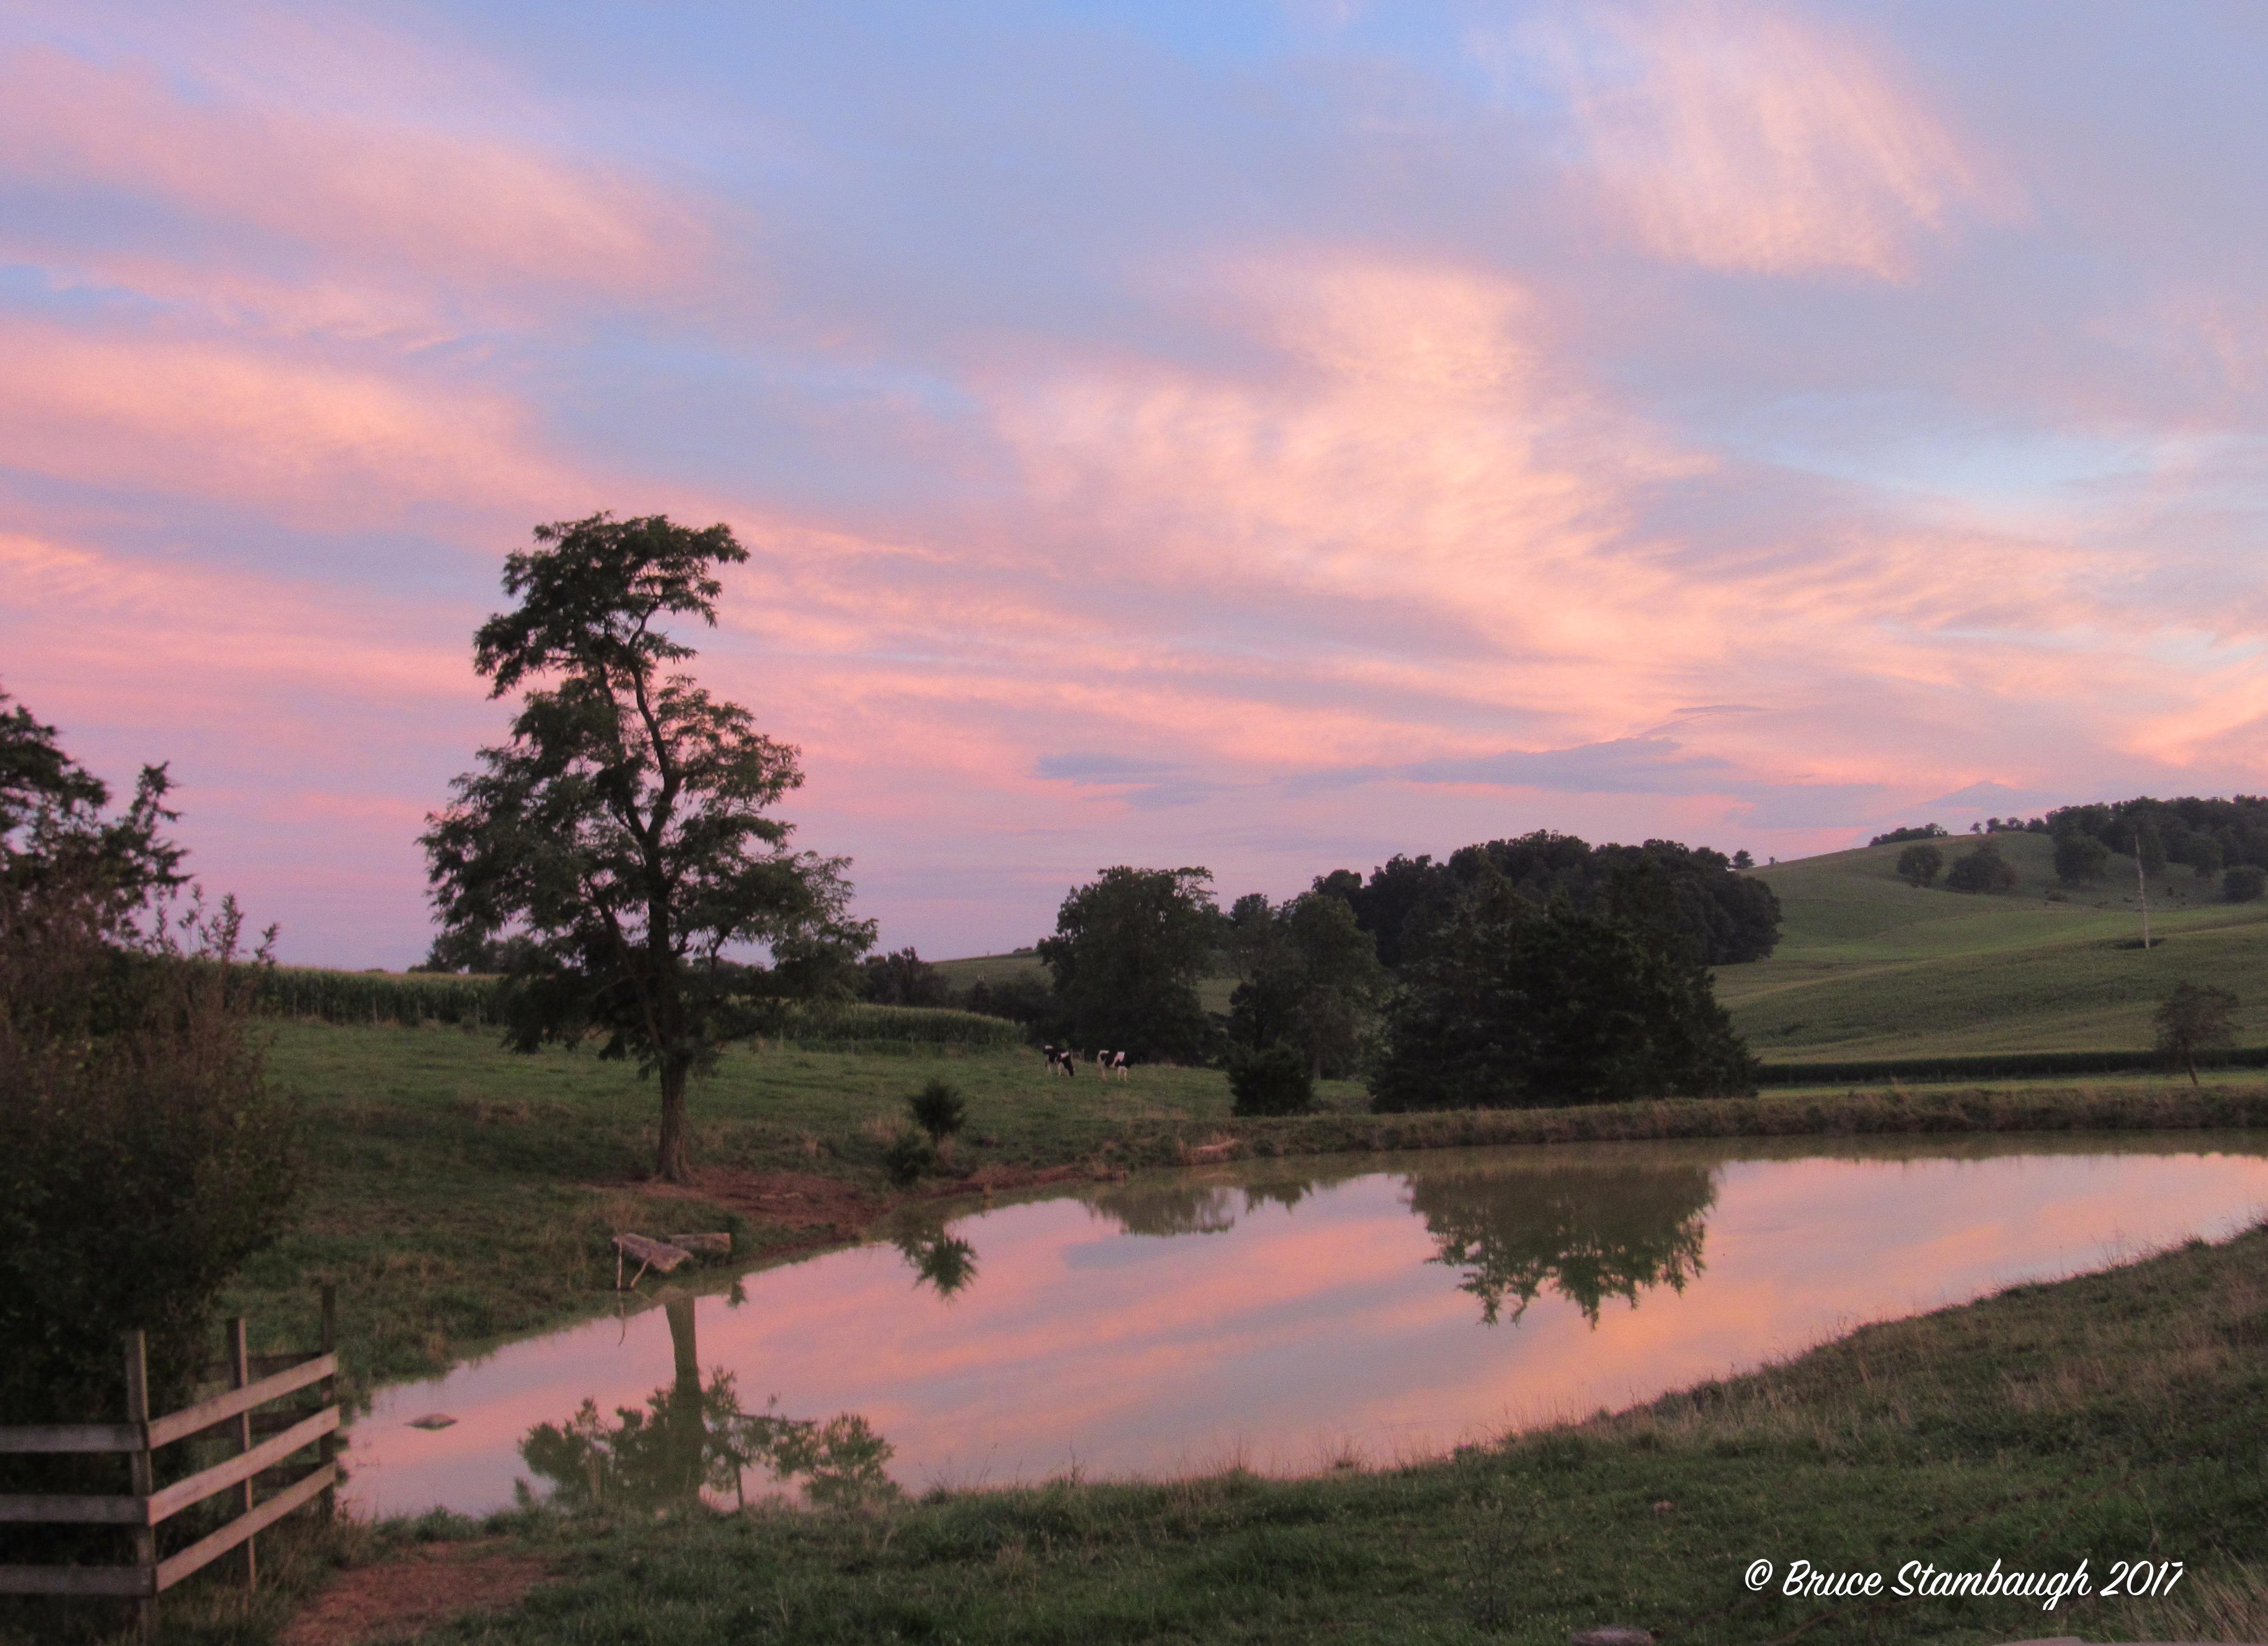 dairy farm, Rockingham Co. VA, Shenandoah Valley